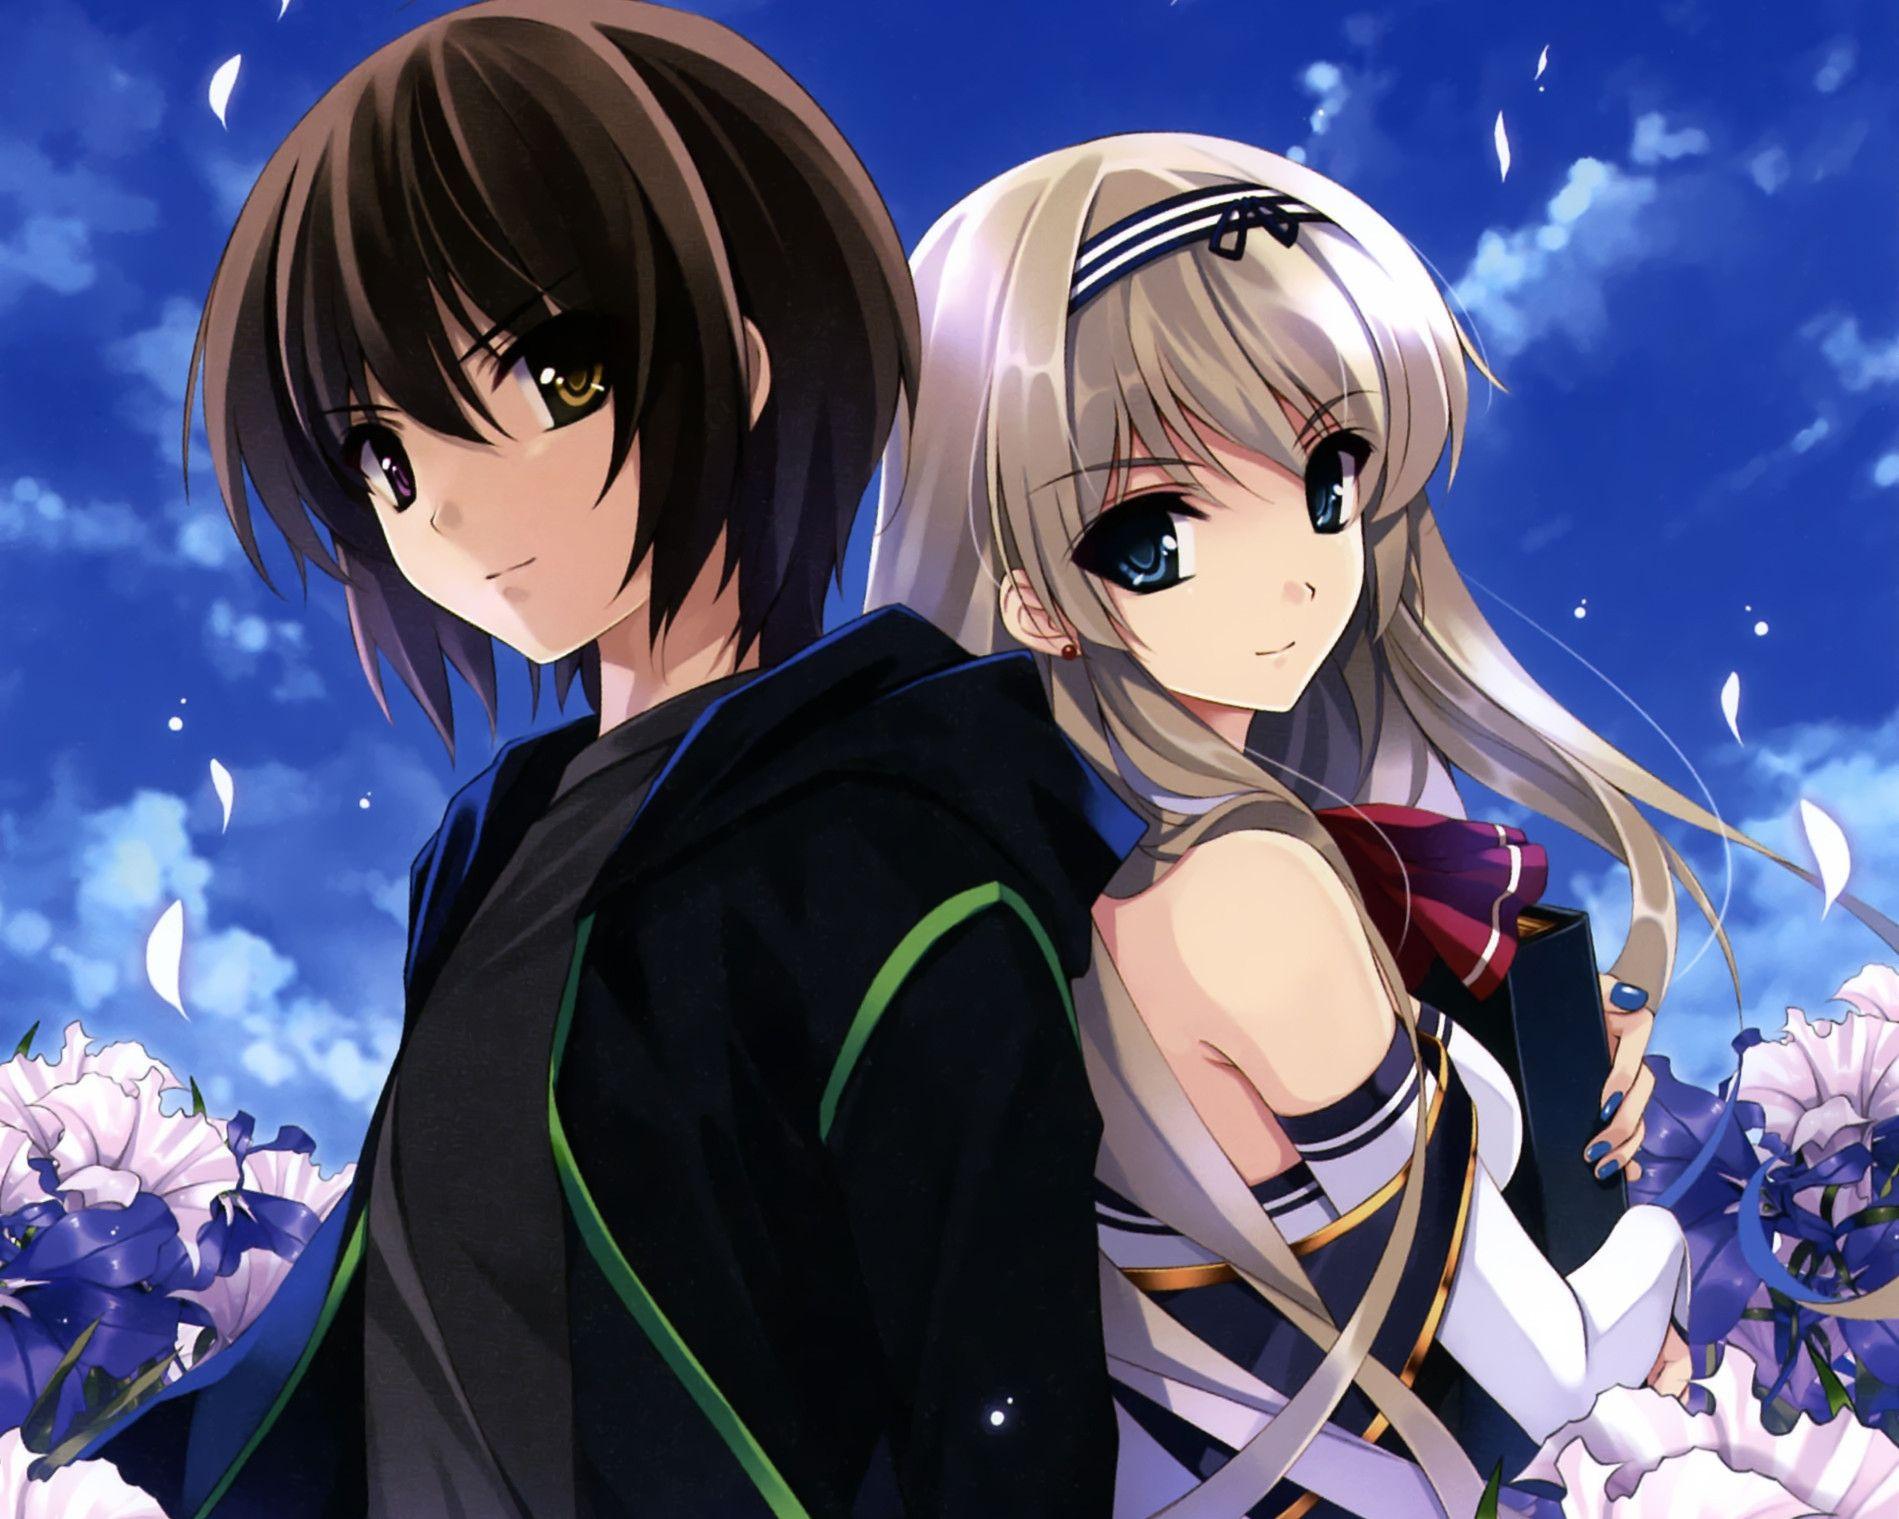 Cute Anime Couple Wallpaper - WallpaperSafari